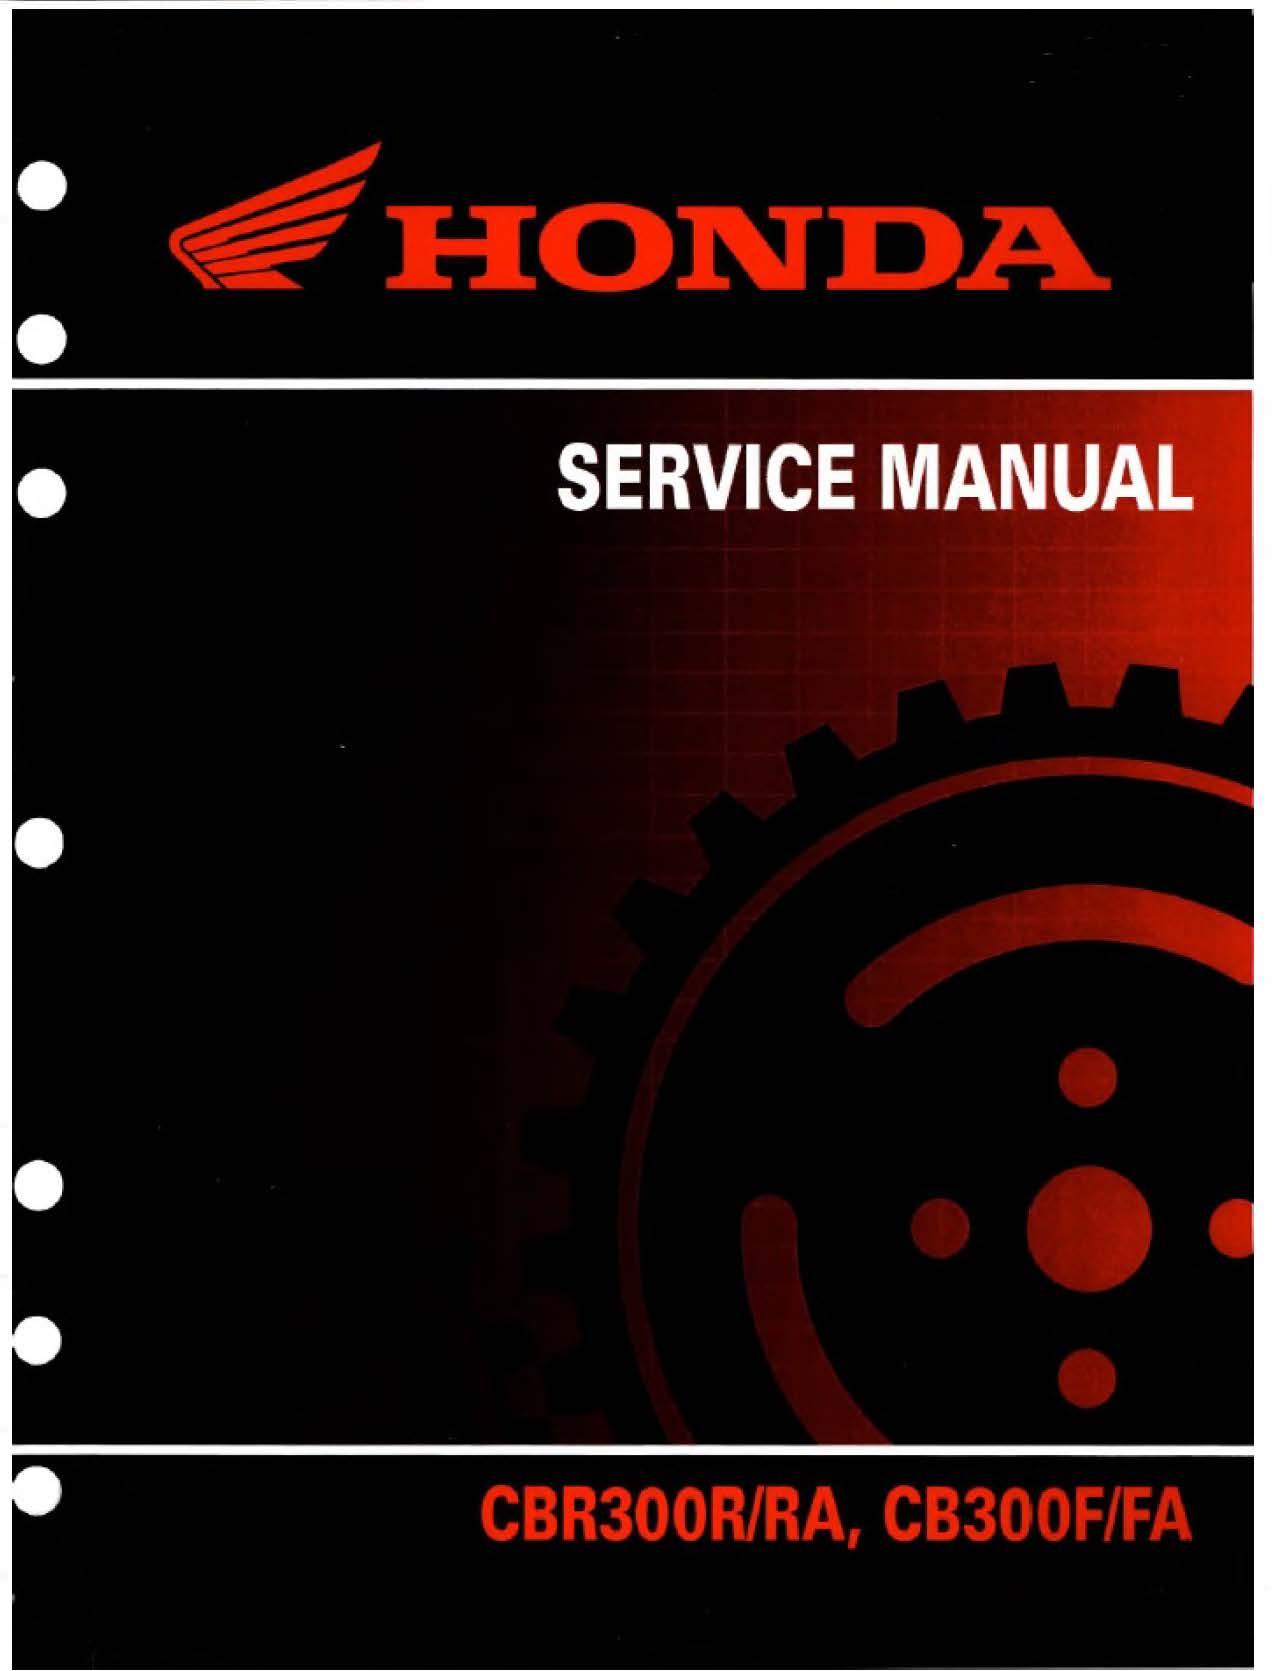 Workshop manual for Honda CBR300F/FA